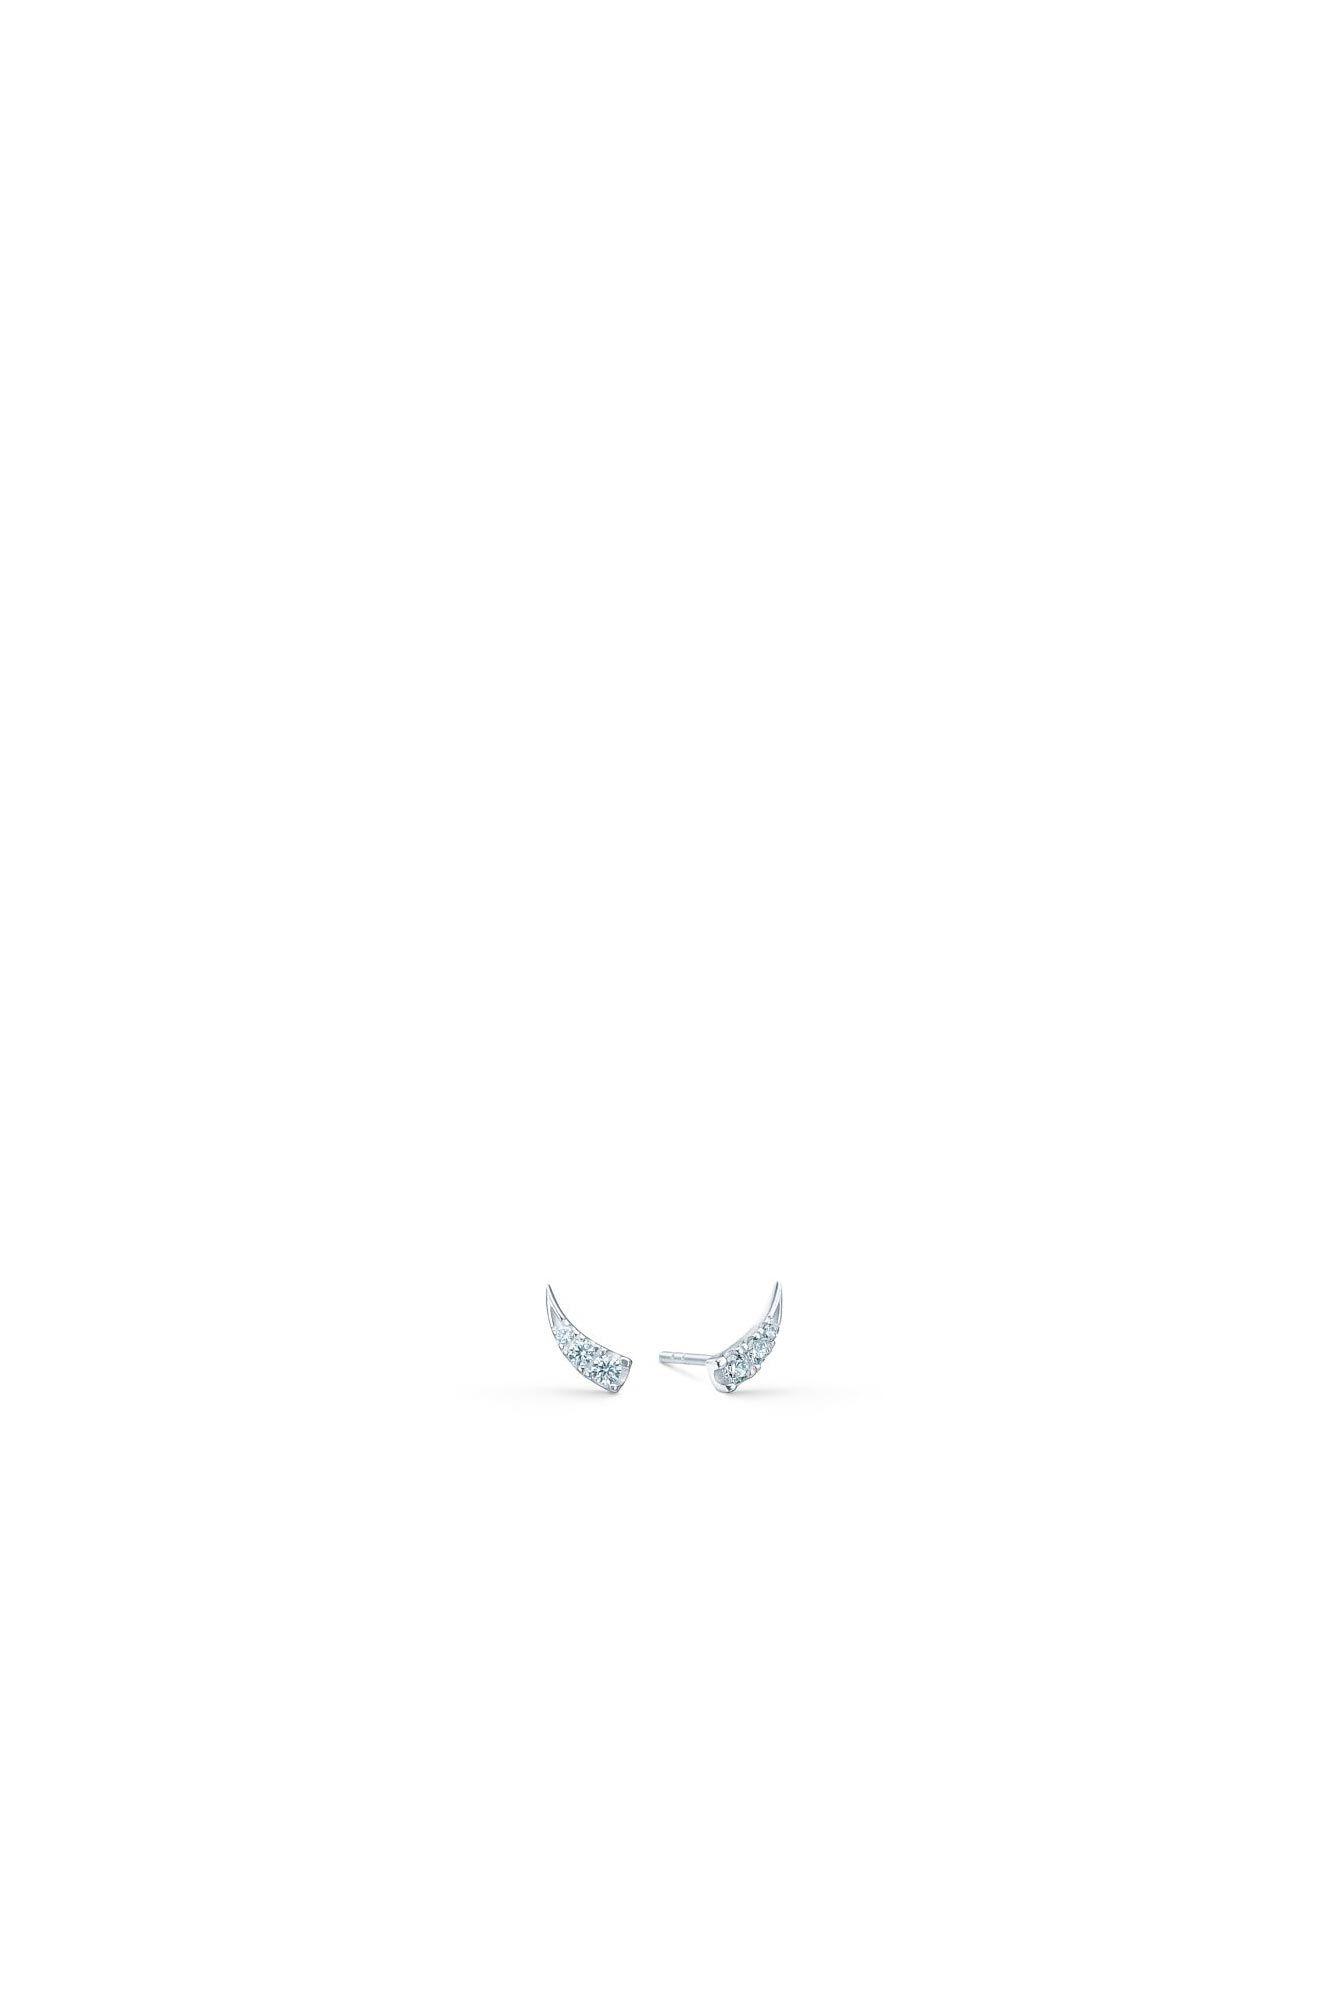 Glace earstuds IDS021RH, RHODIUM/WHITE